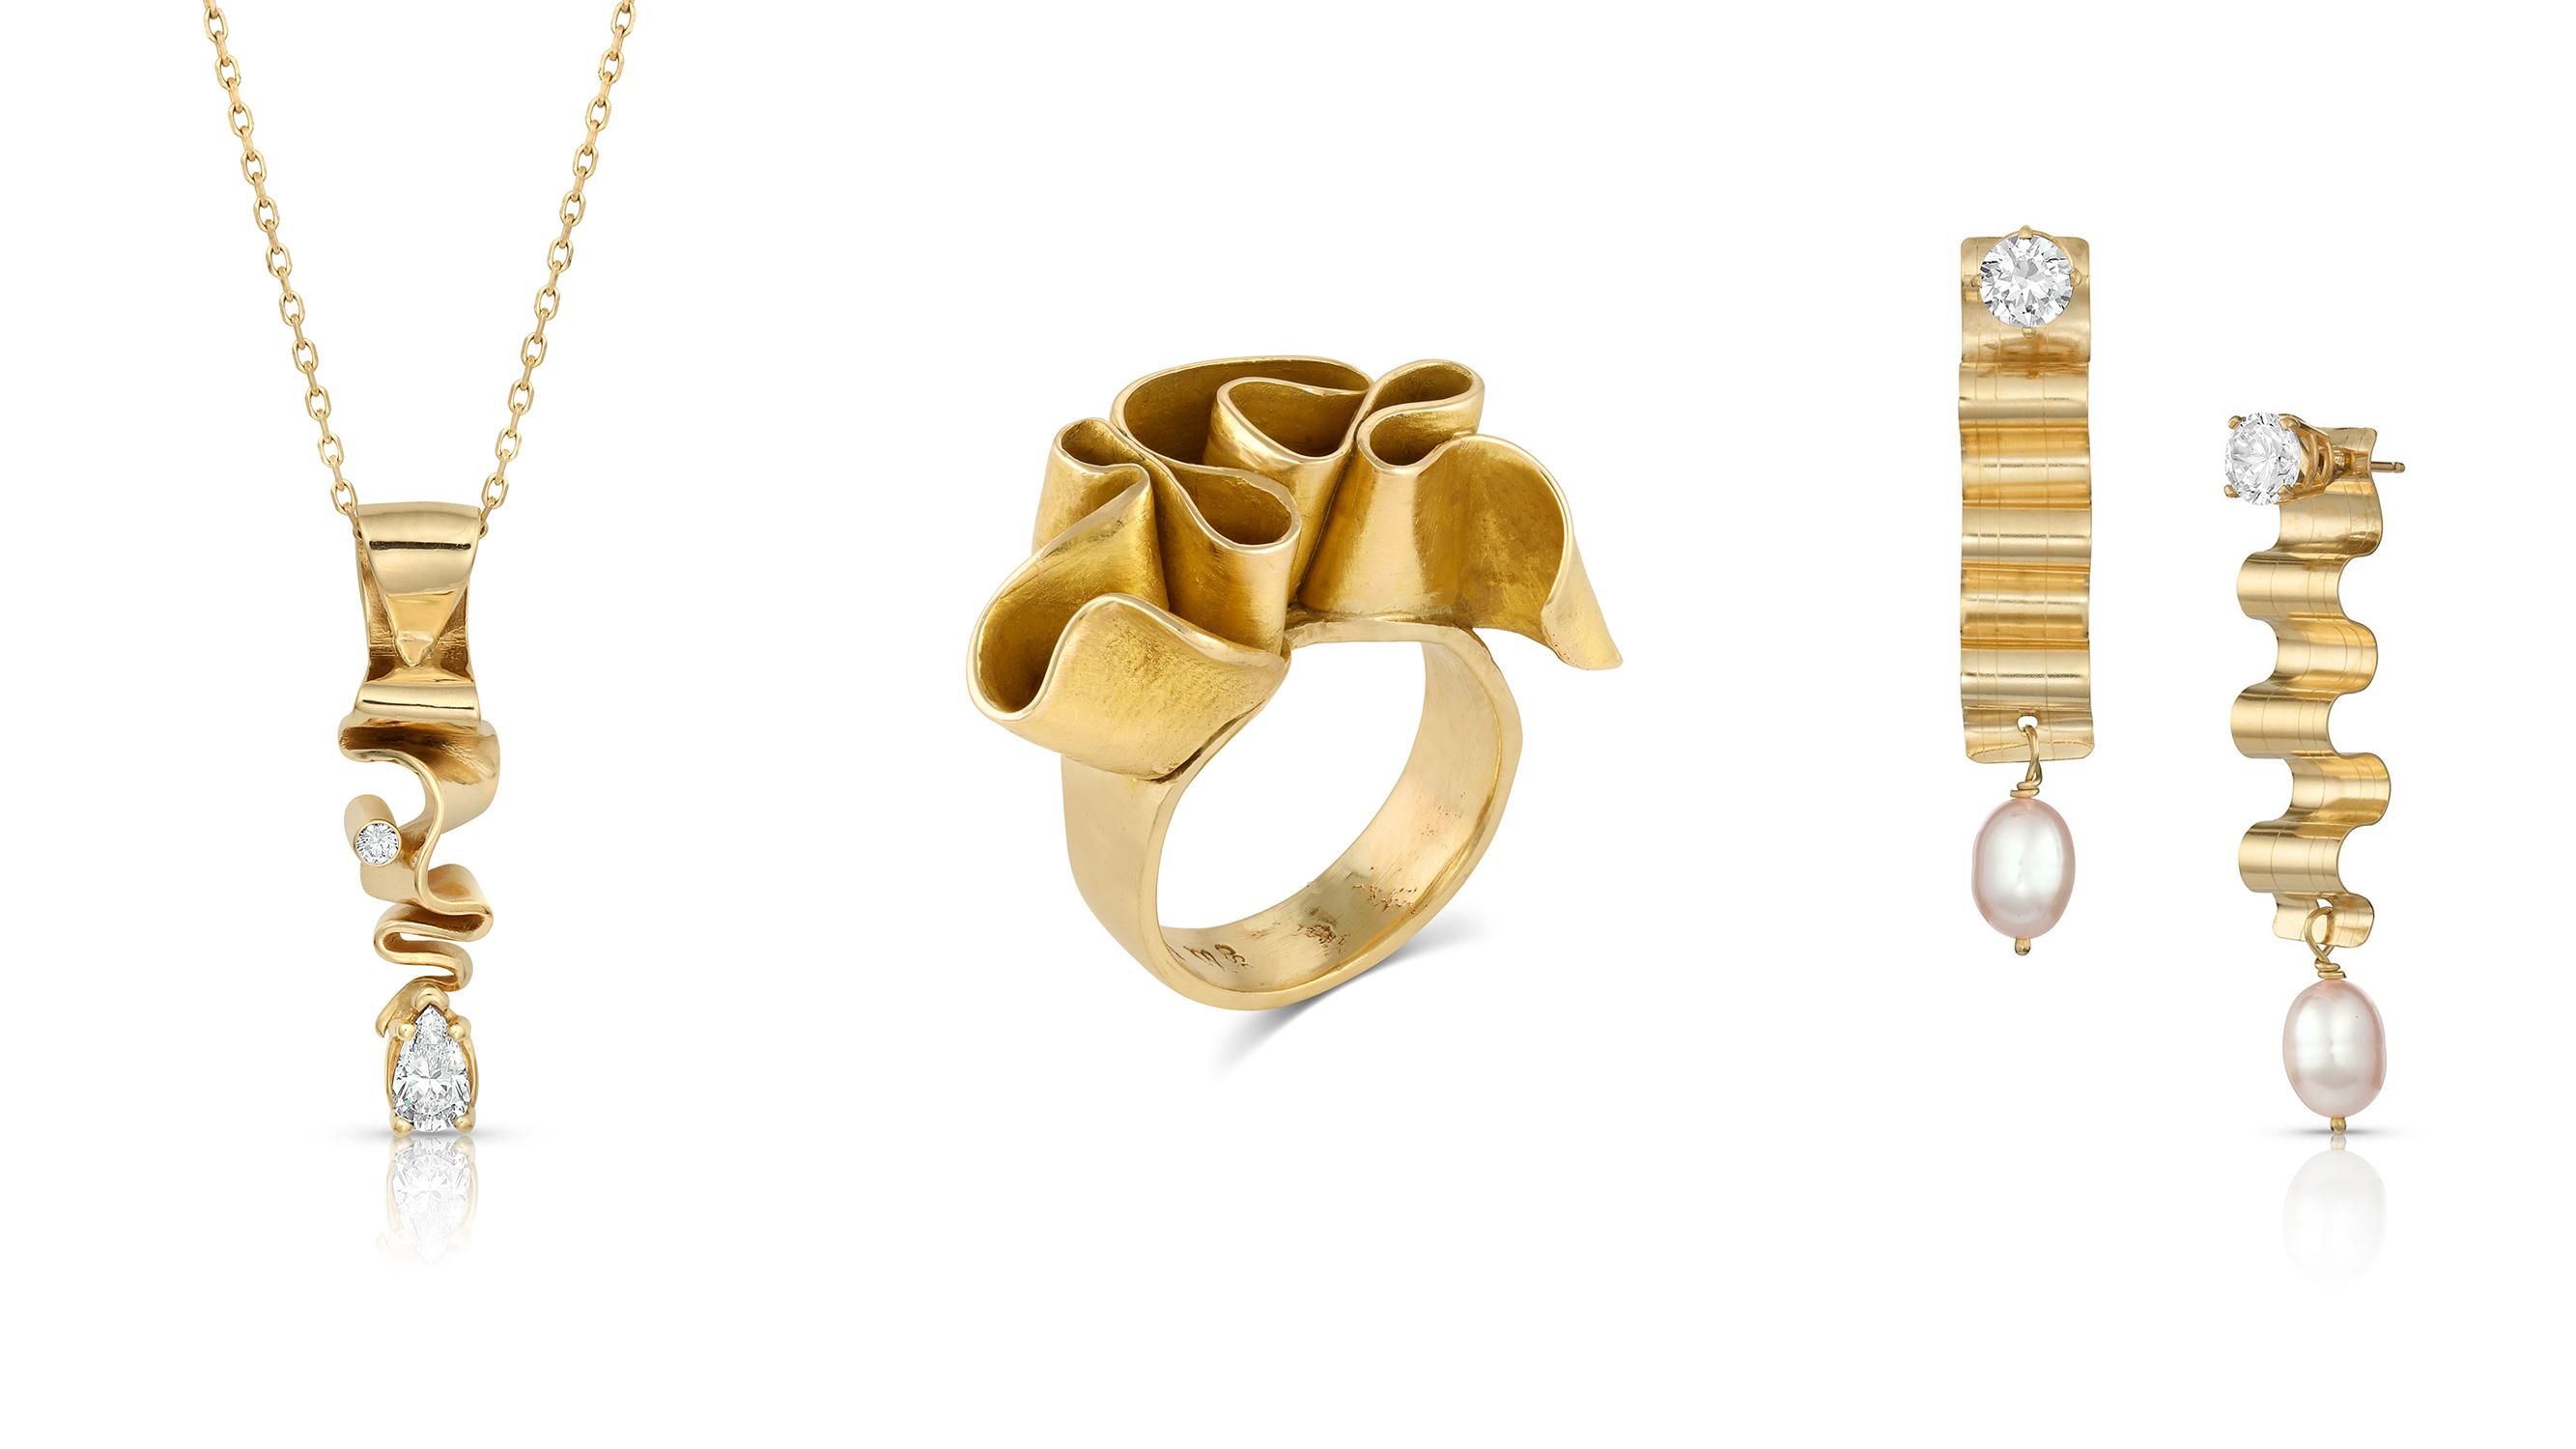 Geralyn Sheridan's 2020 & 2021 Award Winning Jewelry Designs